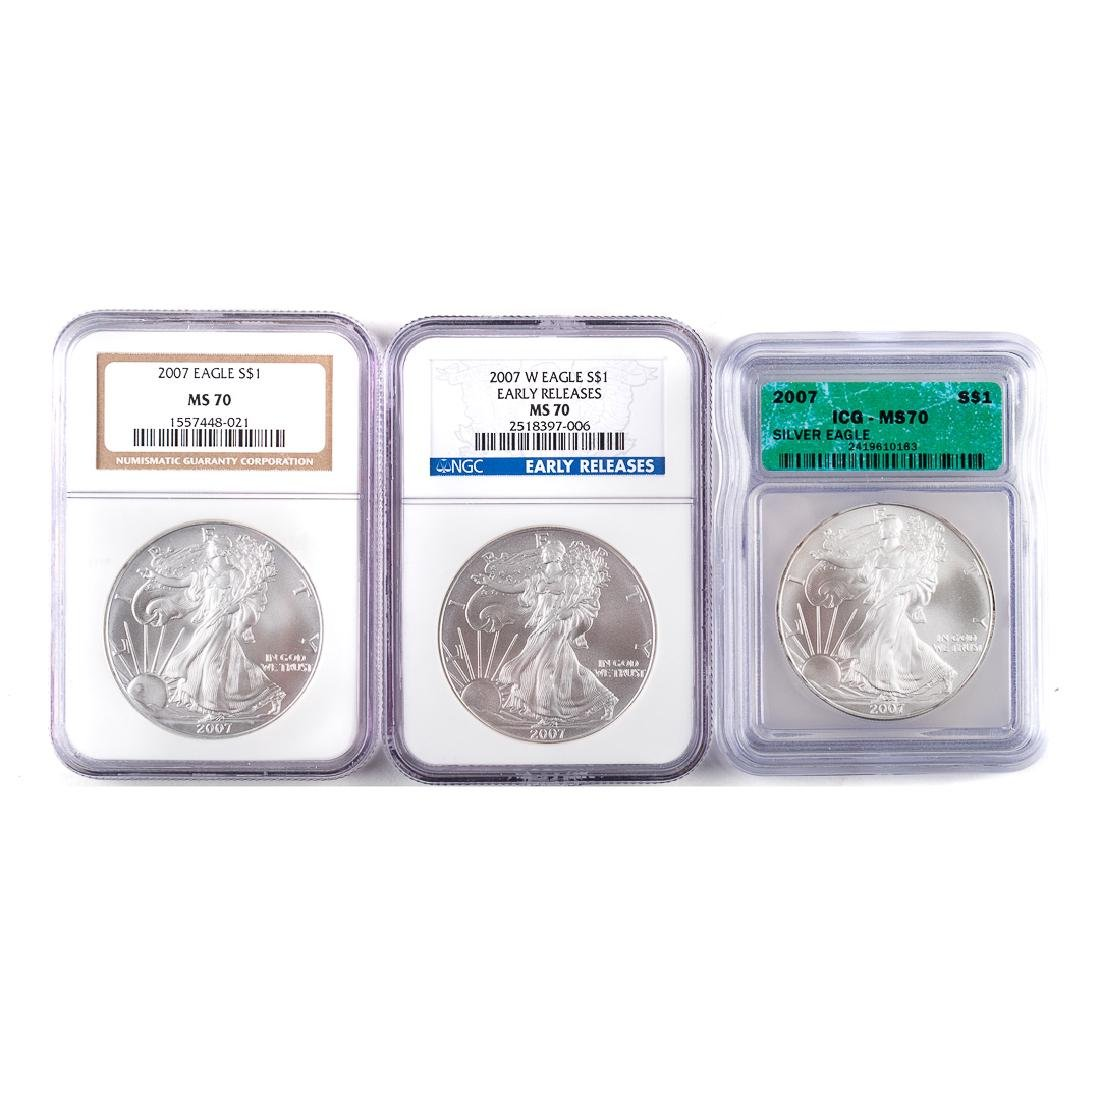 [US] Three MS70 2007 Silver Eagles